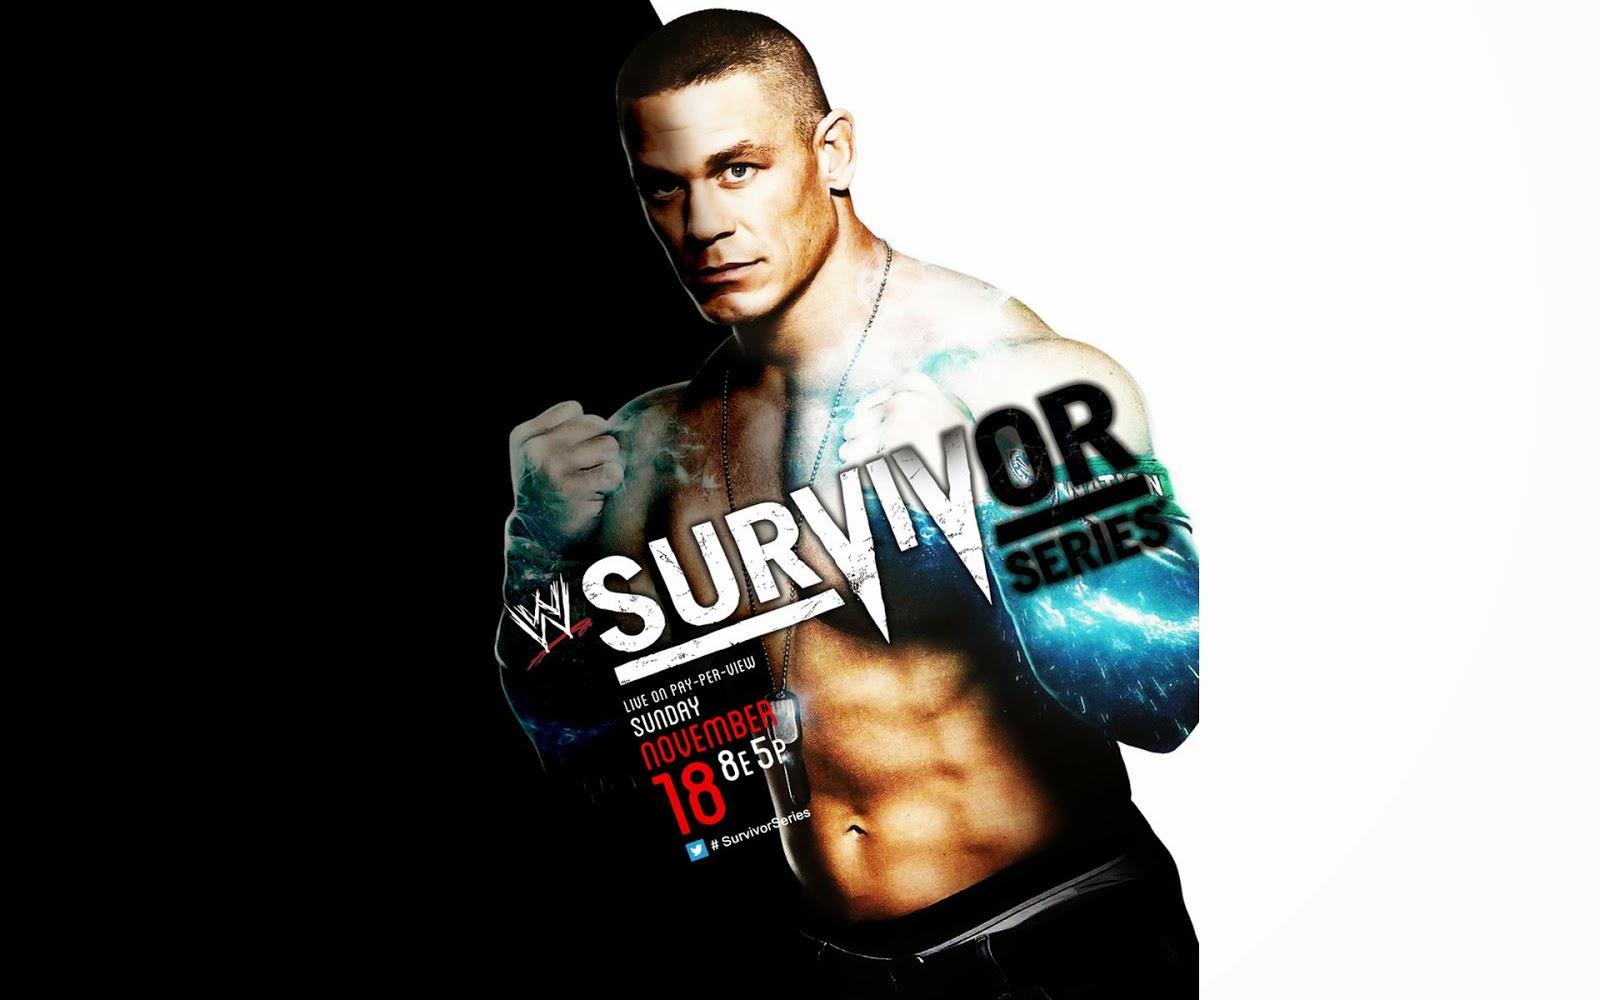 Ravishment: Survivor Series WWE 2013 HD Wallpapers And